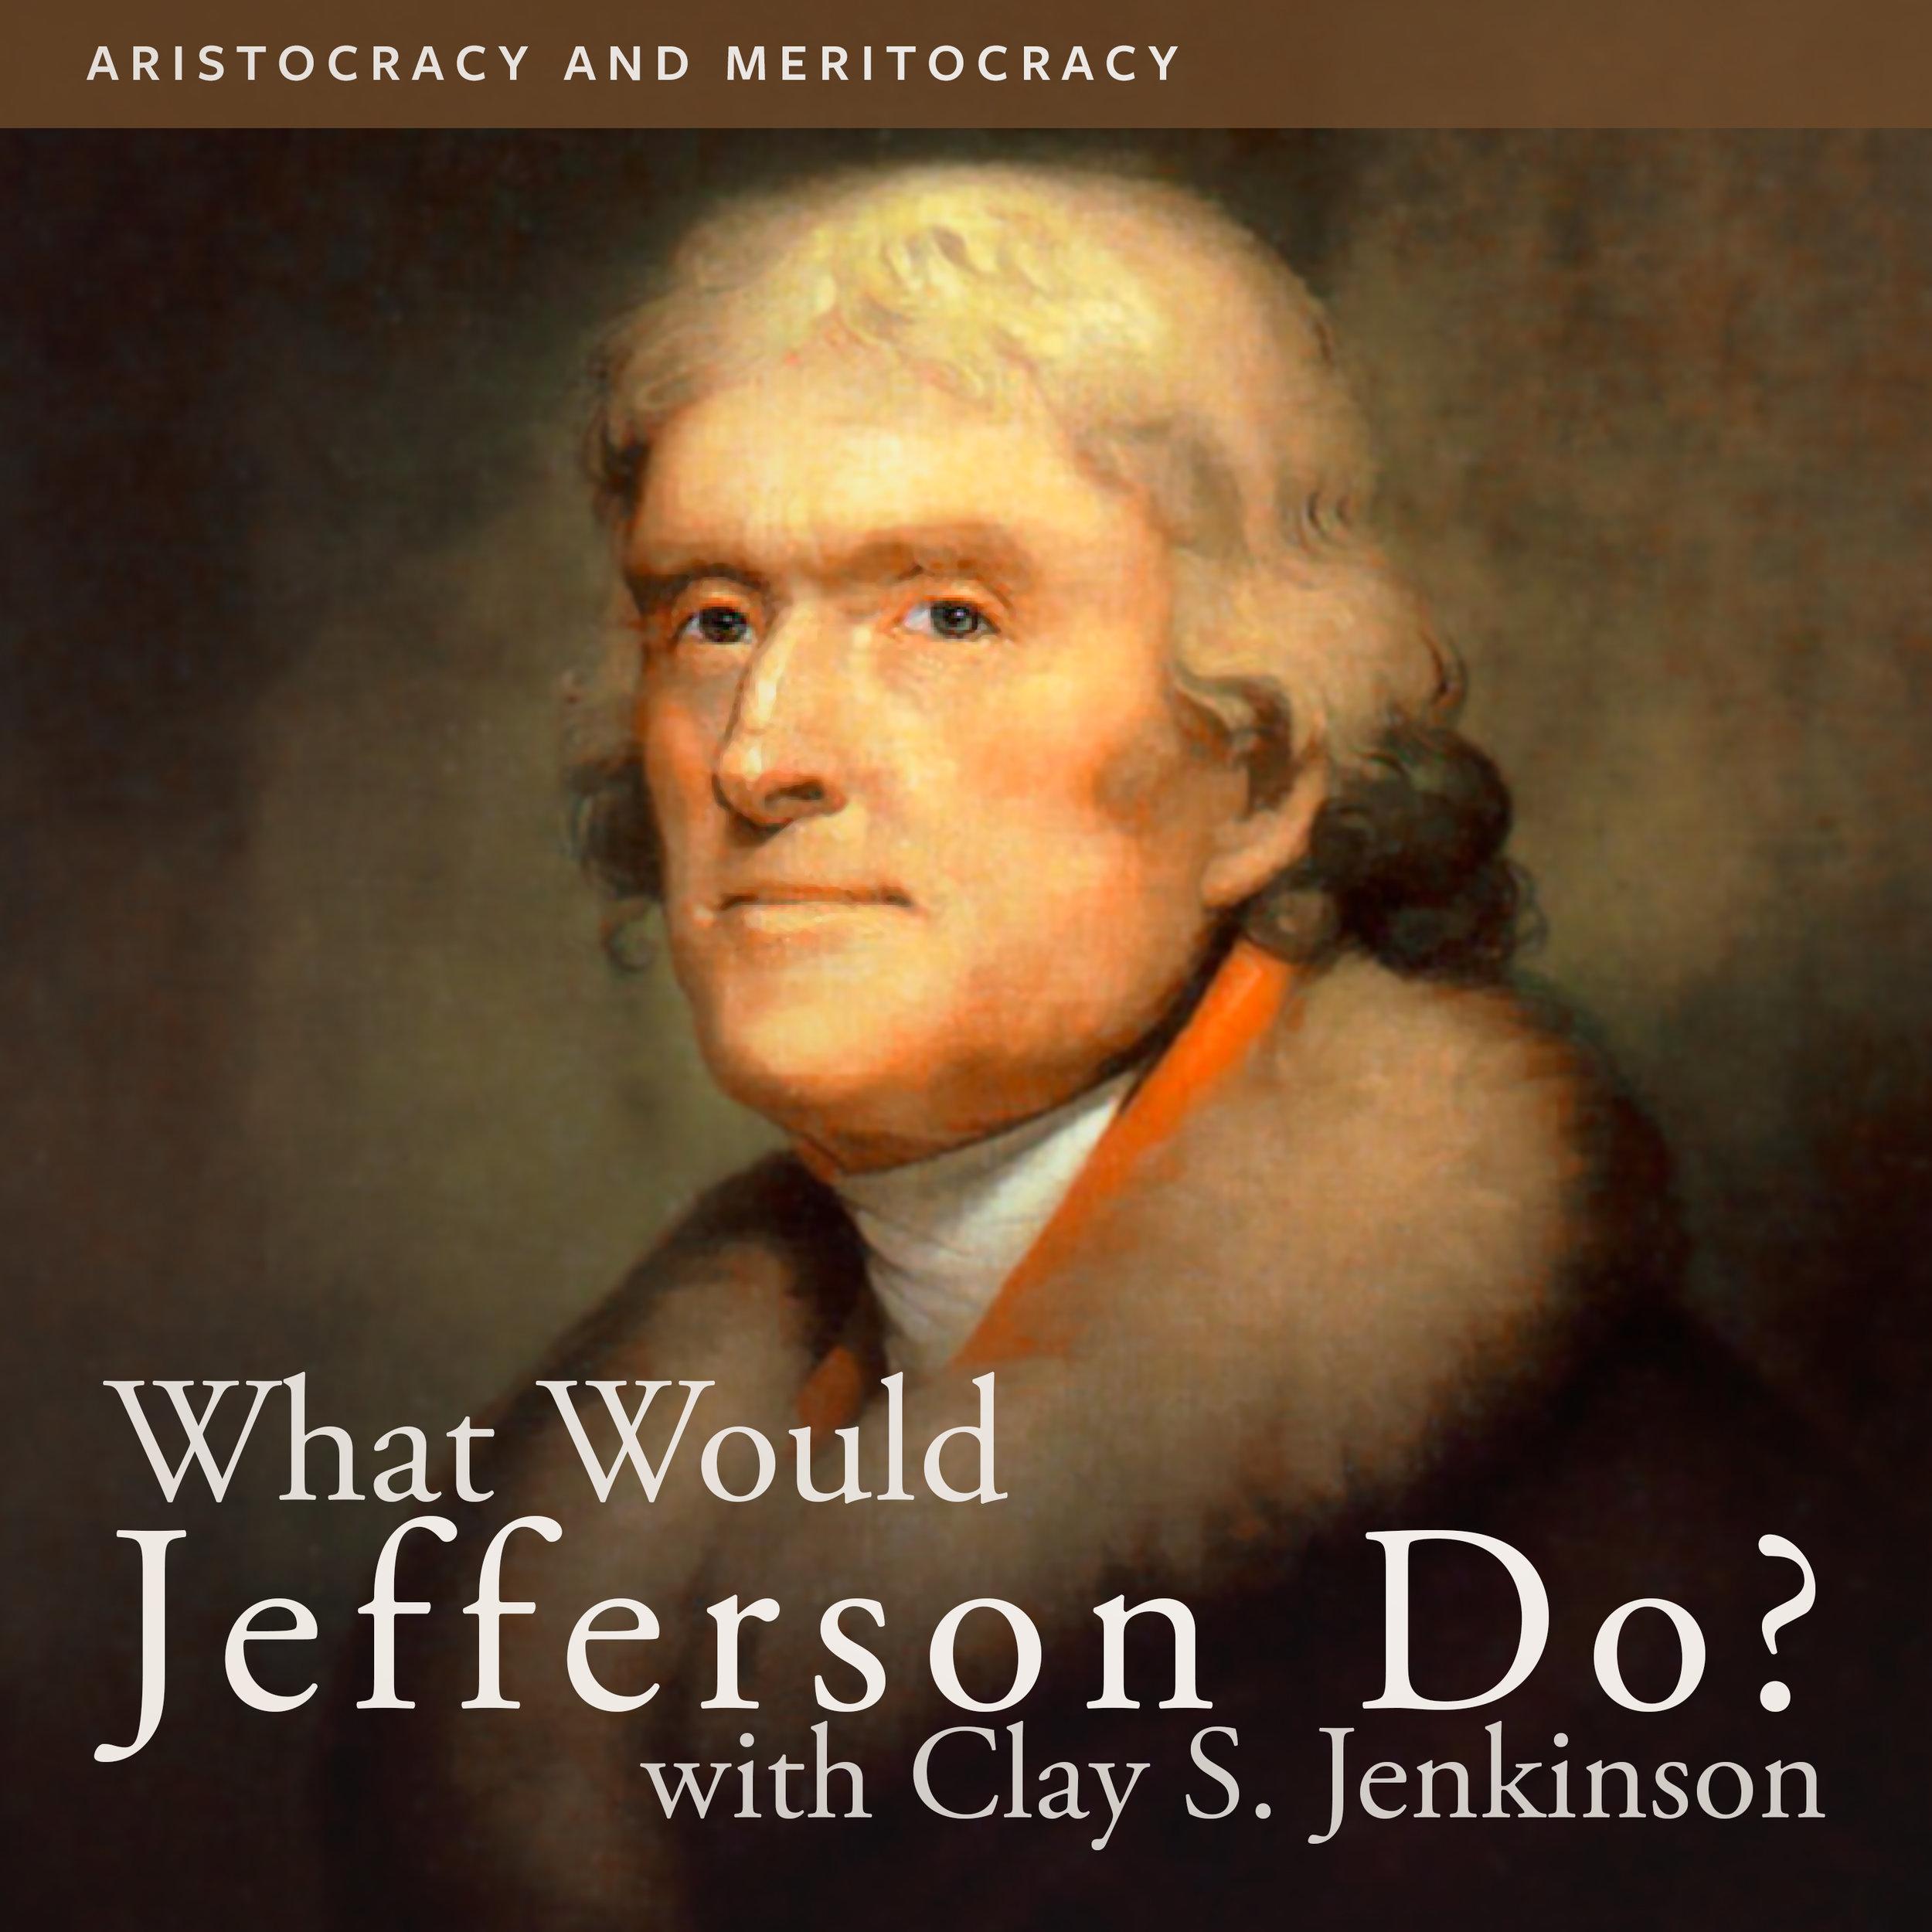 WWTJD_1315 Aristocracy and Meritocracy.jpg